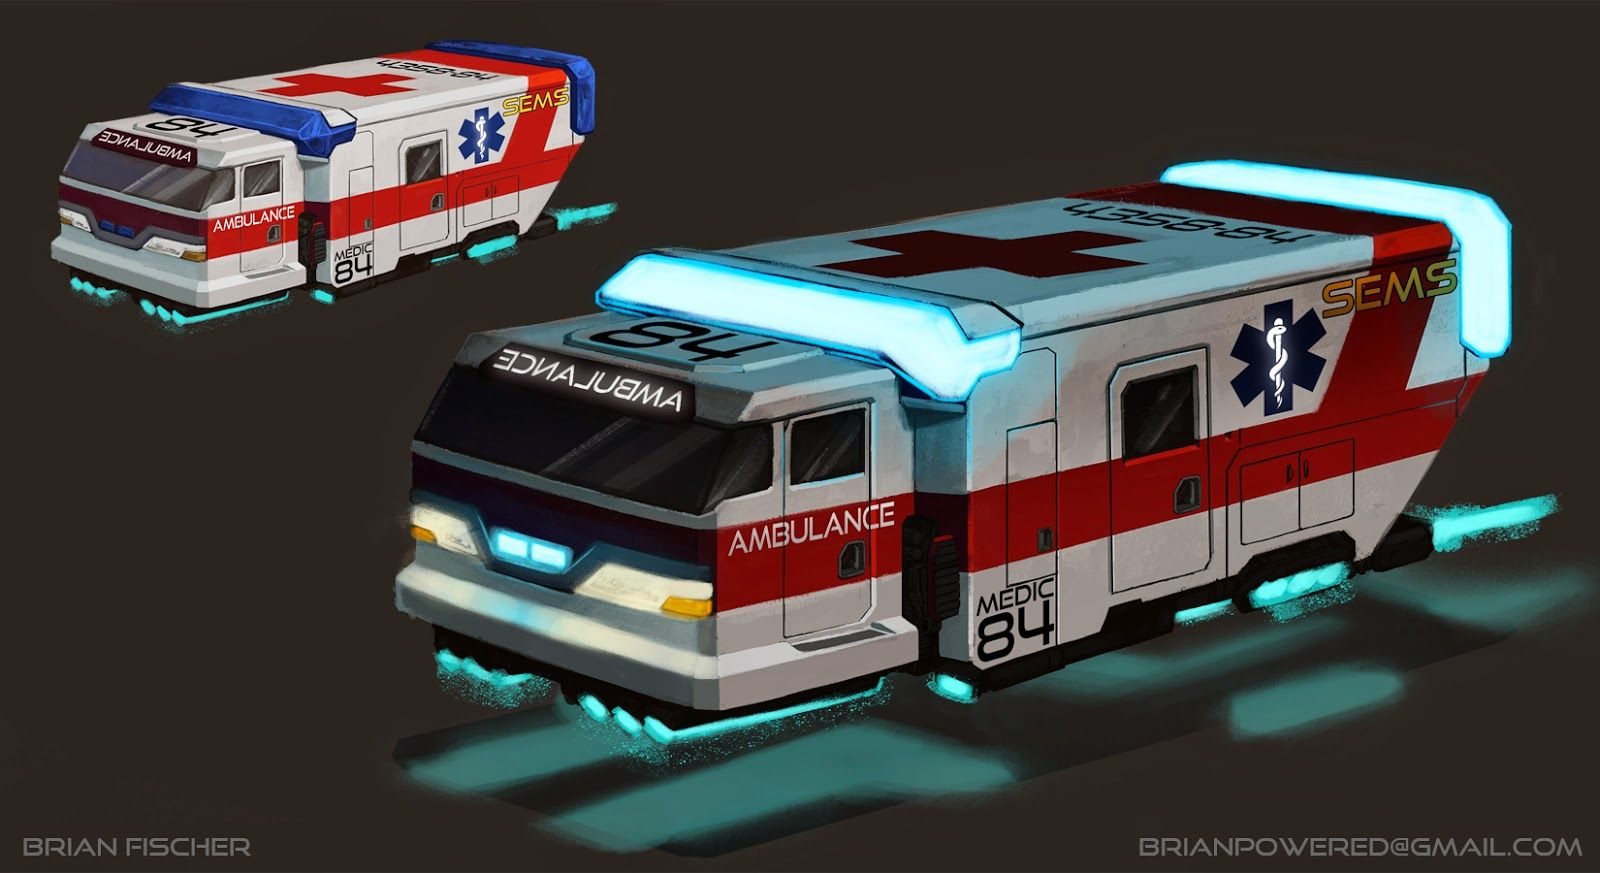 Futuristic Emergency Vehicles